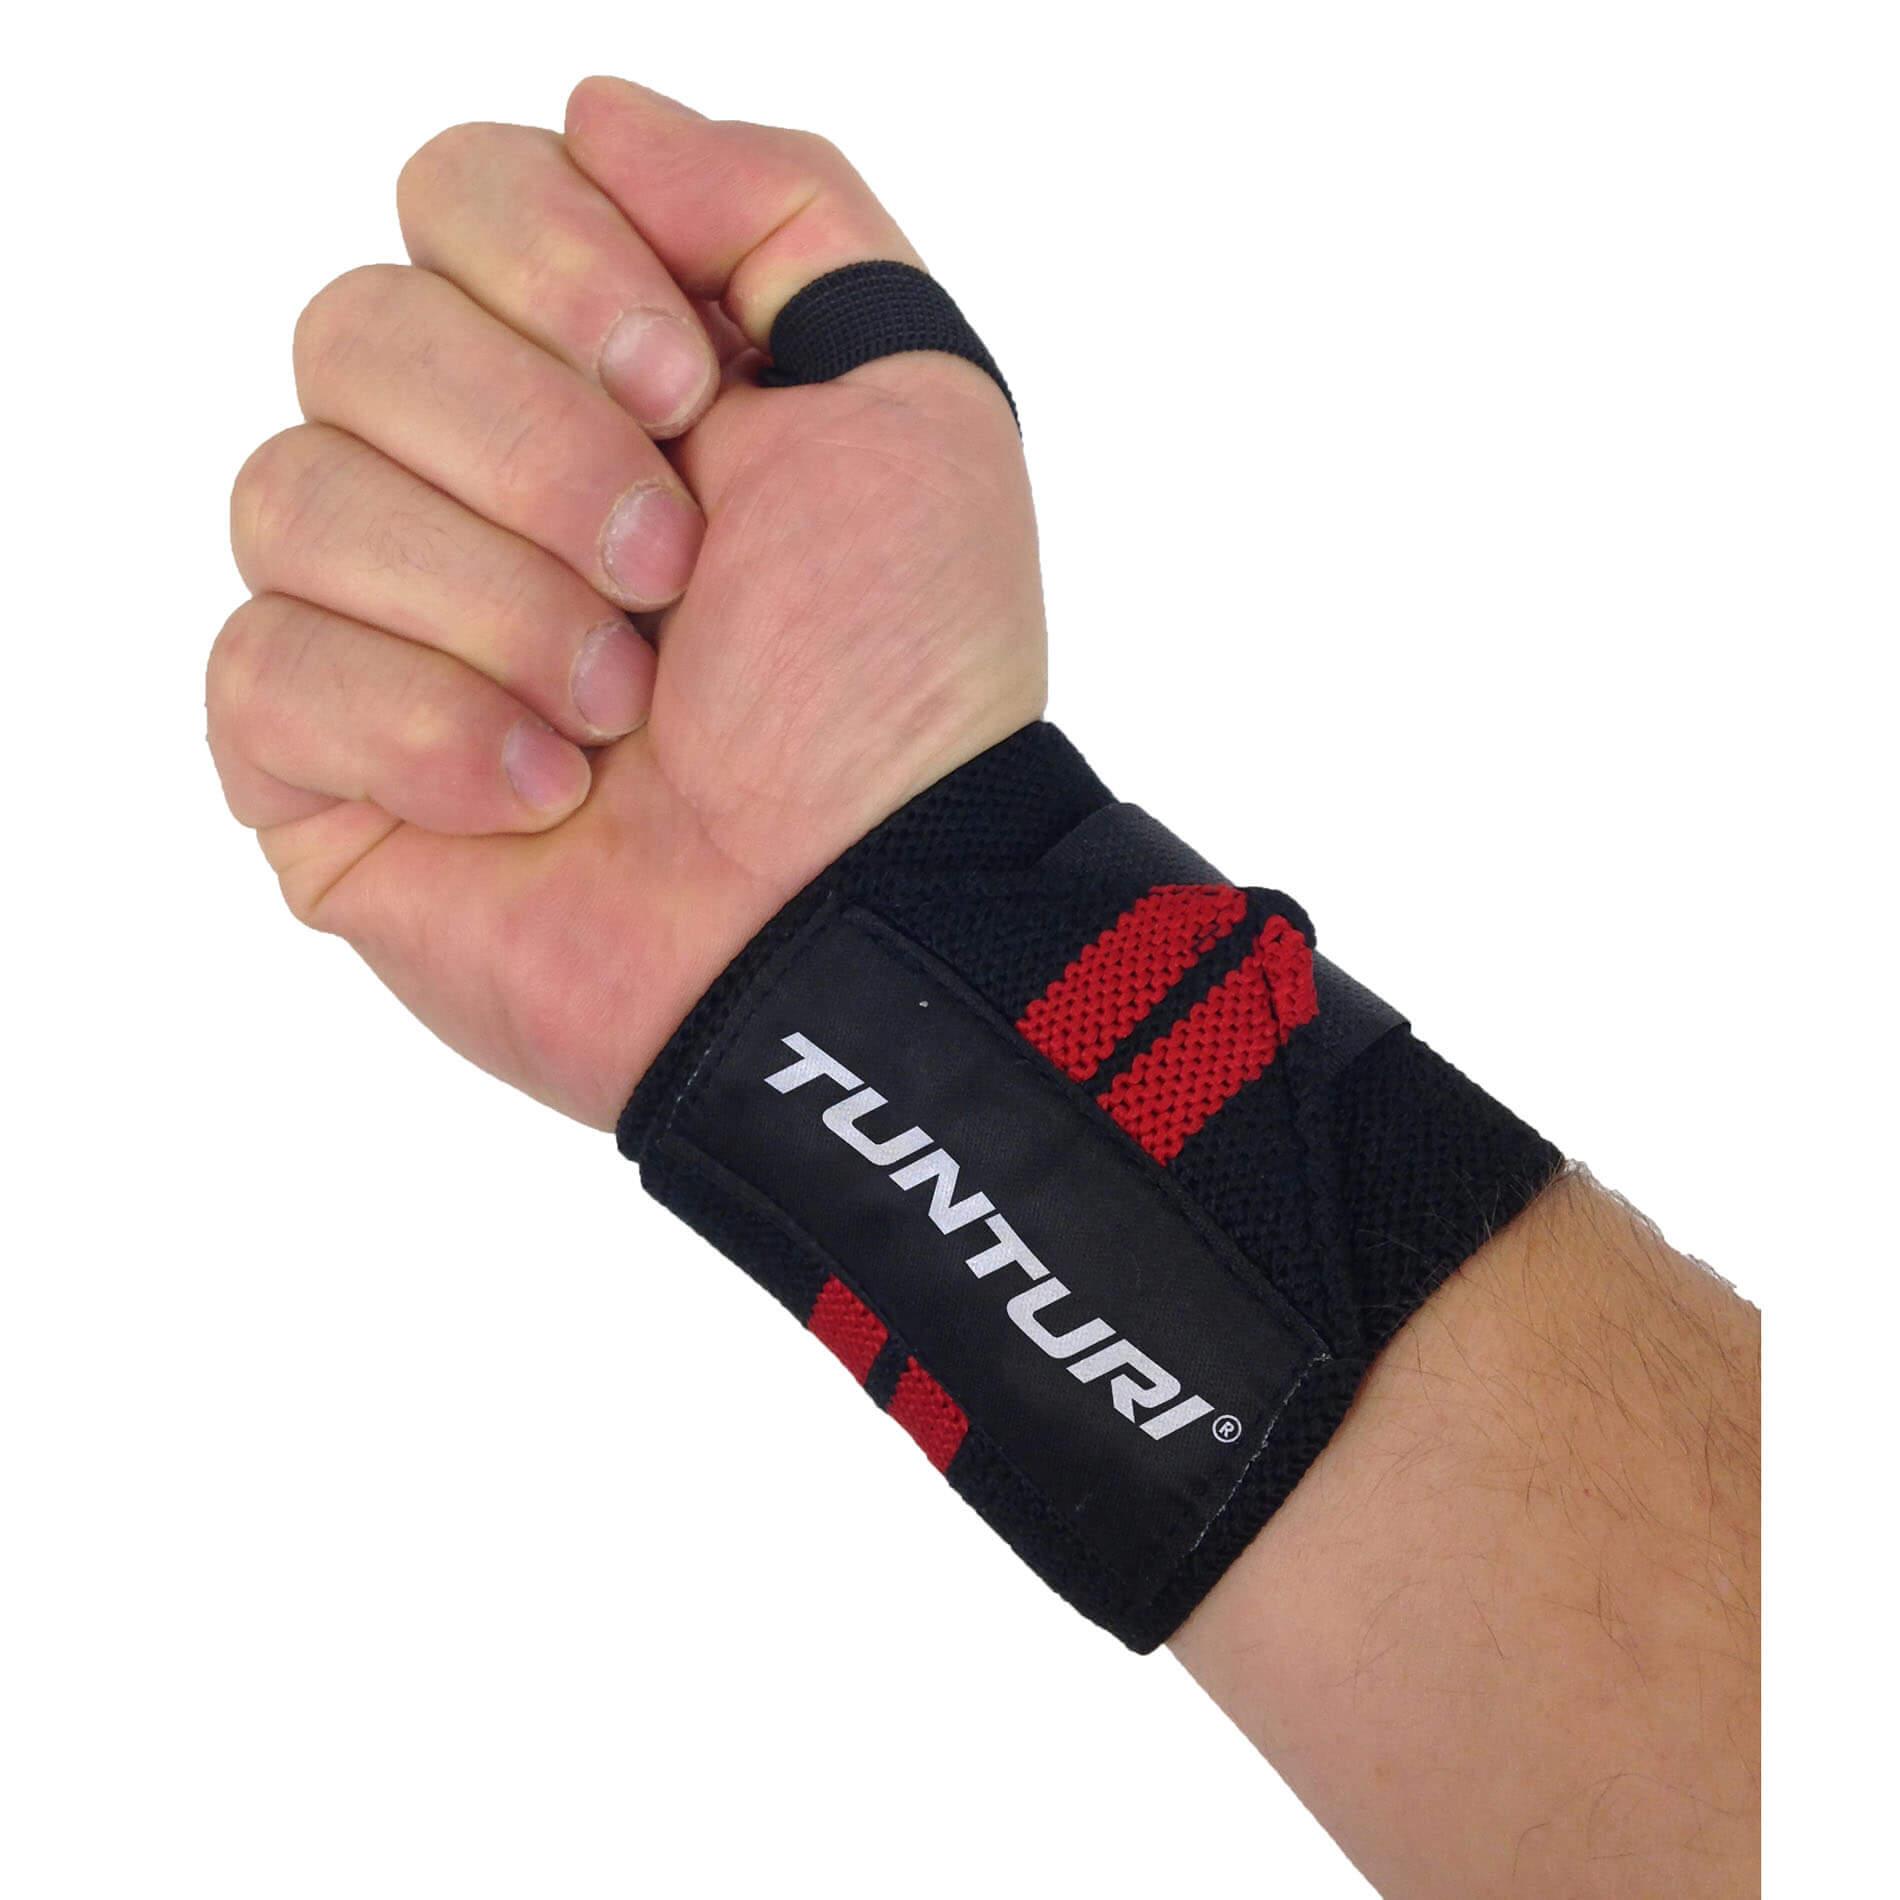 Crossfit  Wrist Wraps - Pols Wraps - Rood - per paar